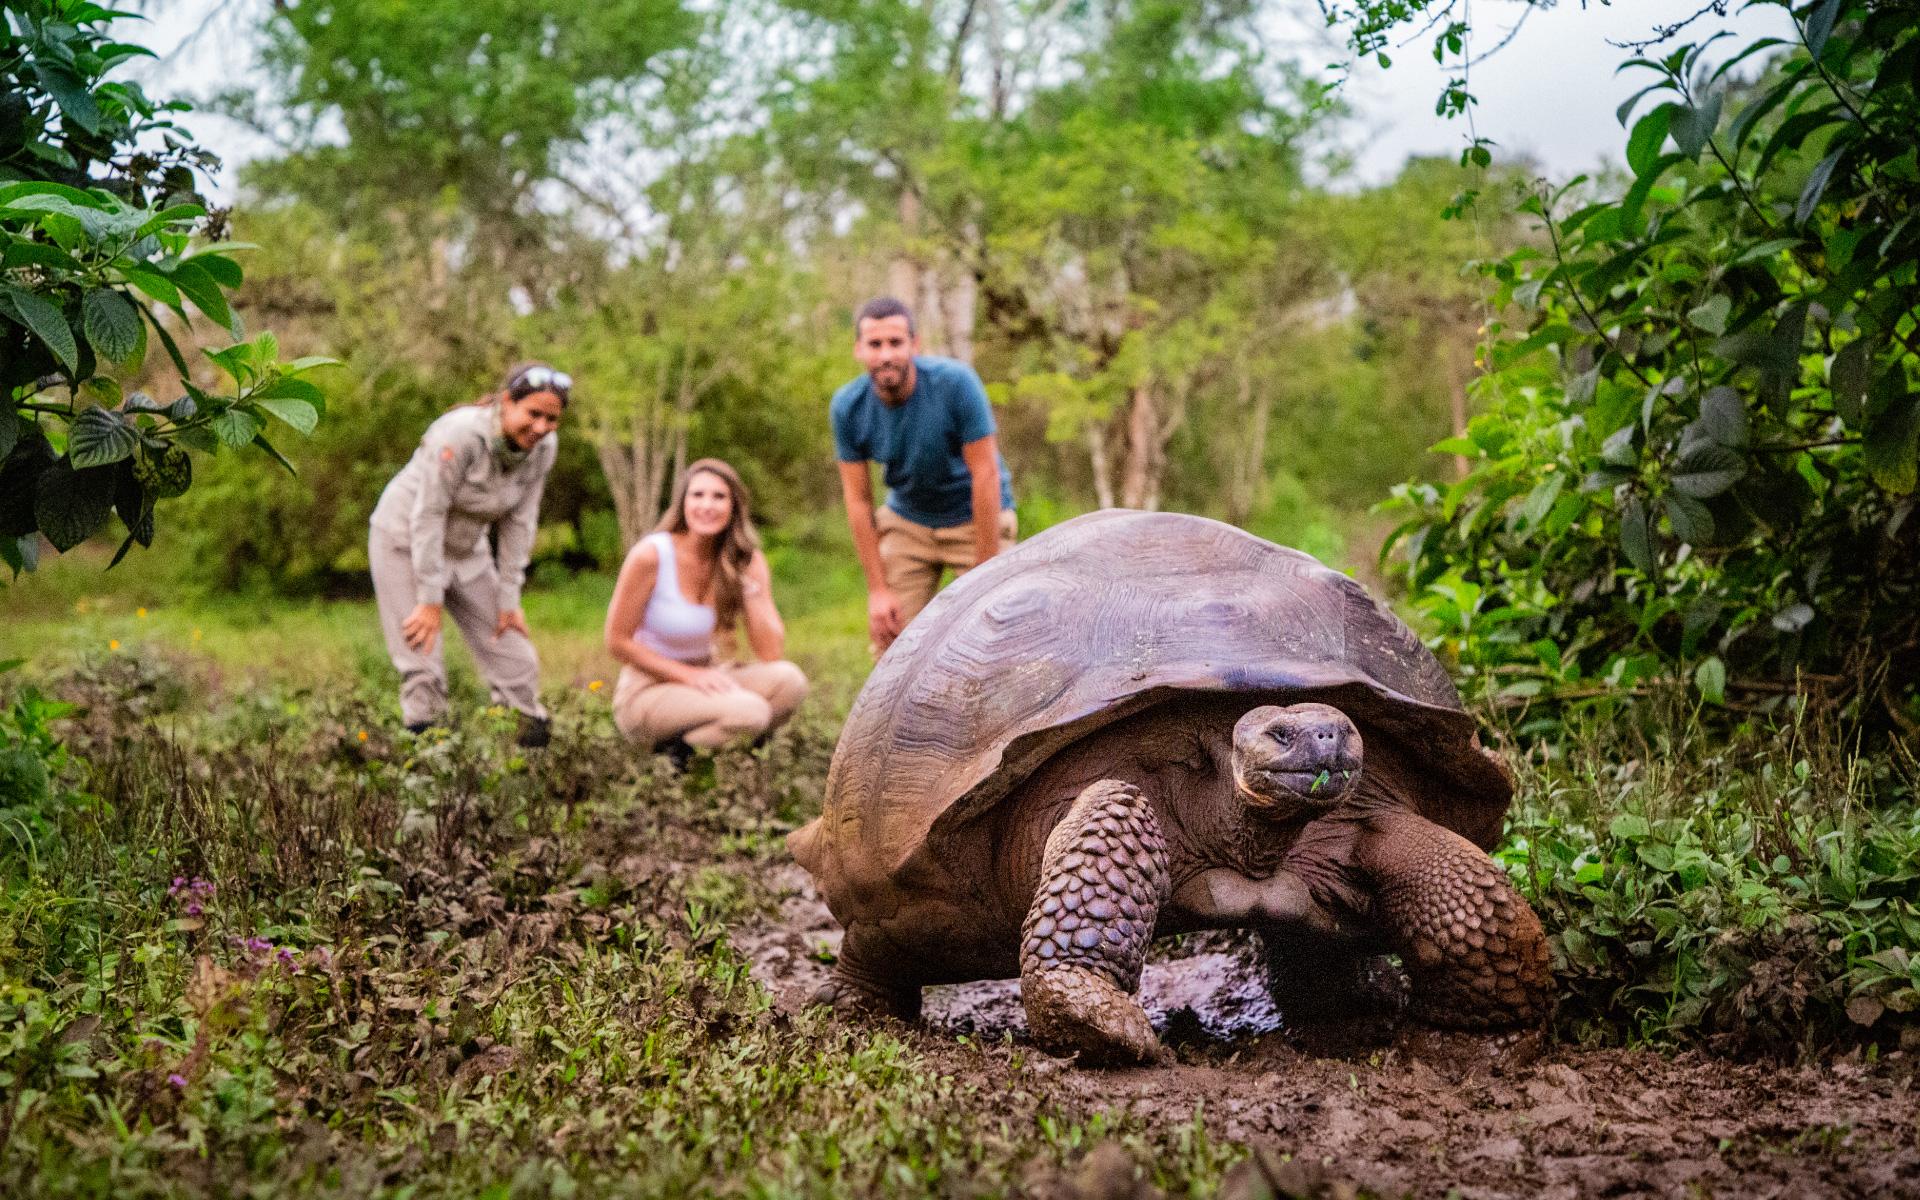 Galapagos giant tortoise at Manzanillo